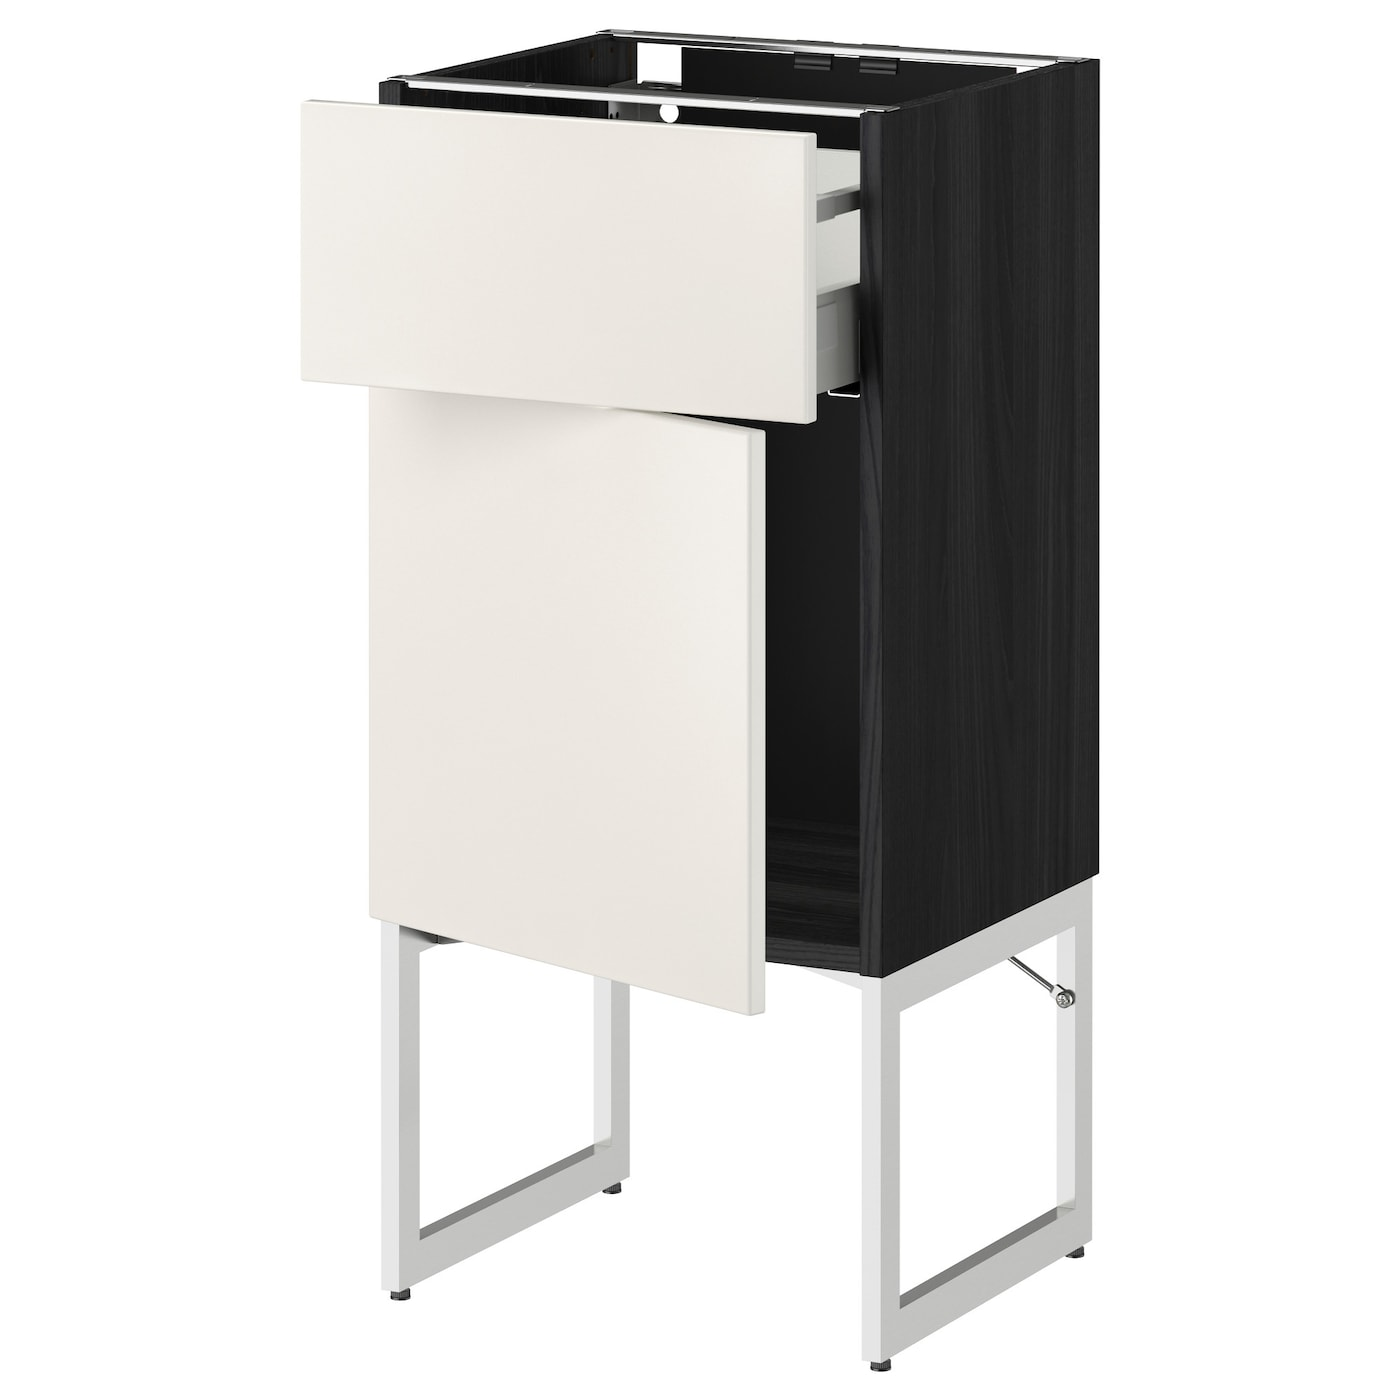 metod maximera base cabinet with drawer door black veddinge white 40x37x60 cm ikea. Black Bedroom Furniture Sets. Home Design Ideas